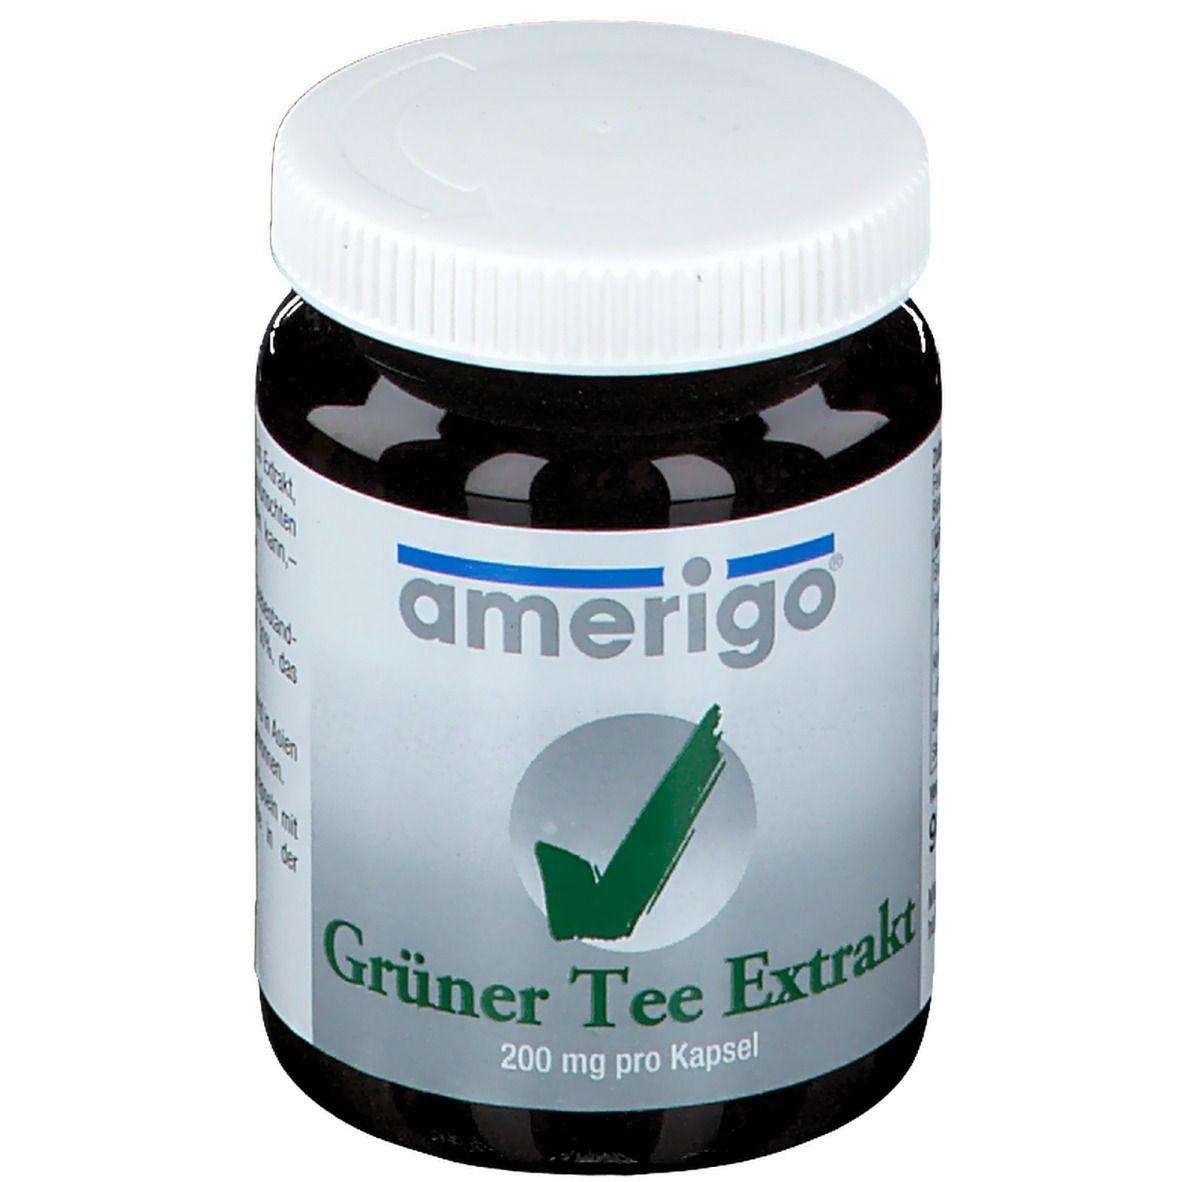 Image of Grüner Tee Extrakt Amerigo Kapseln